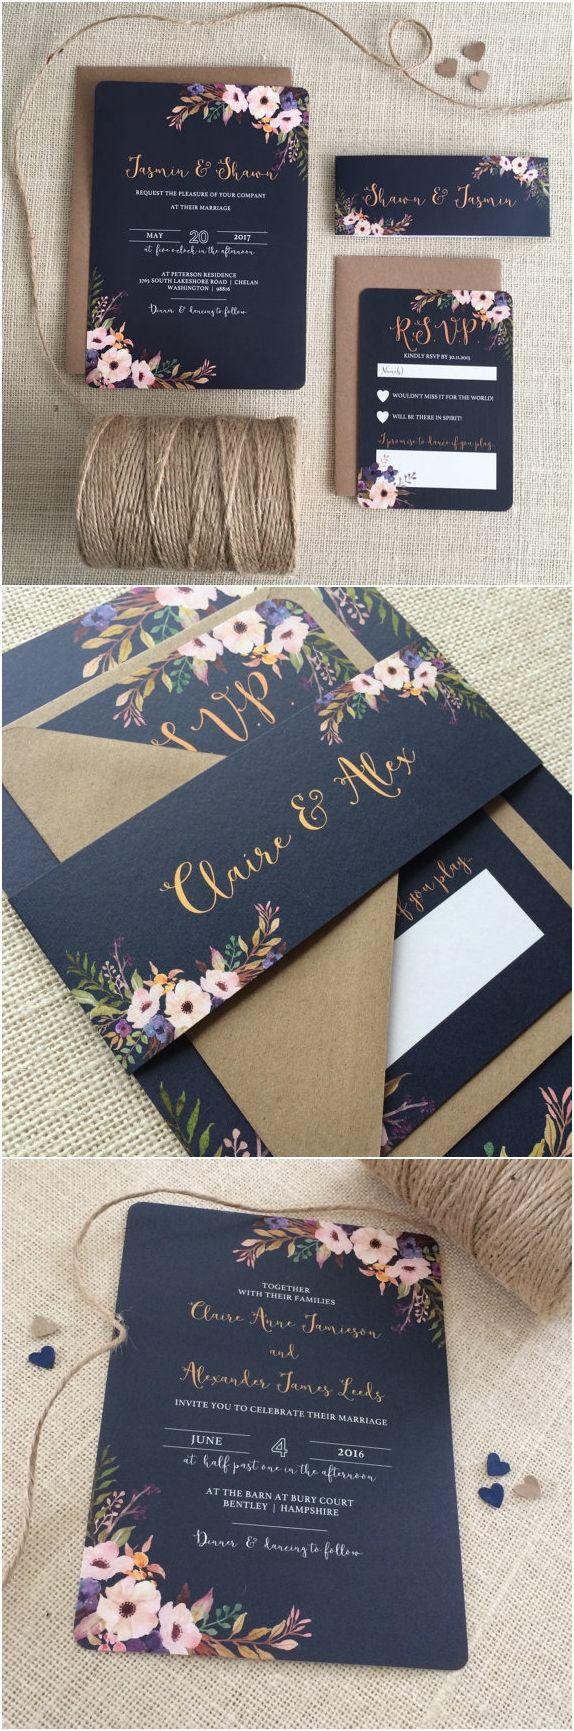 best wedding decoration images on pinterest wedding color